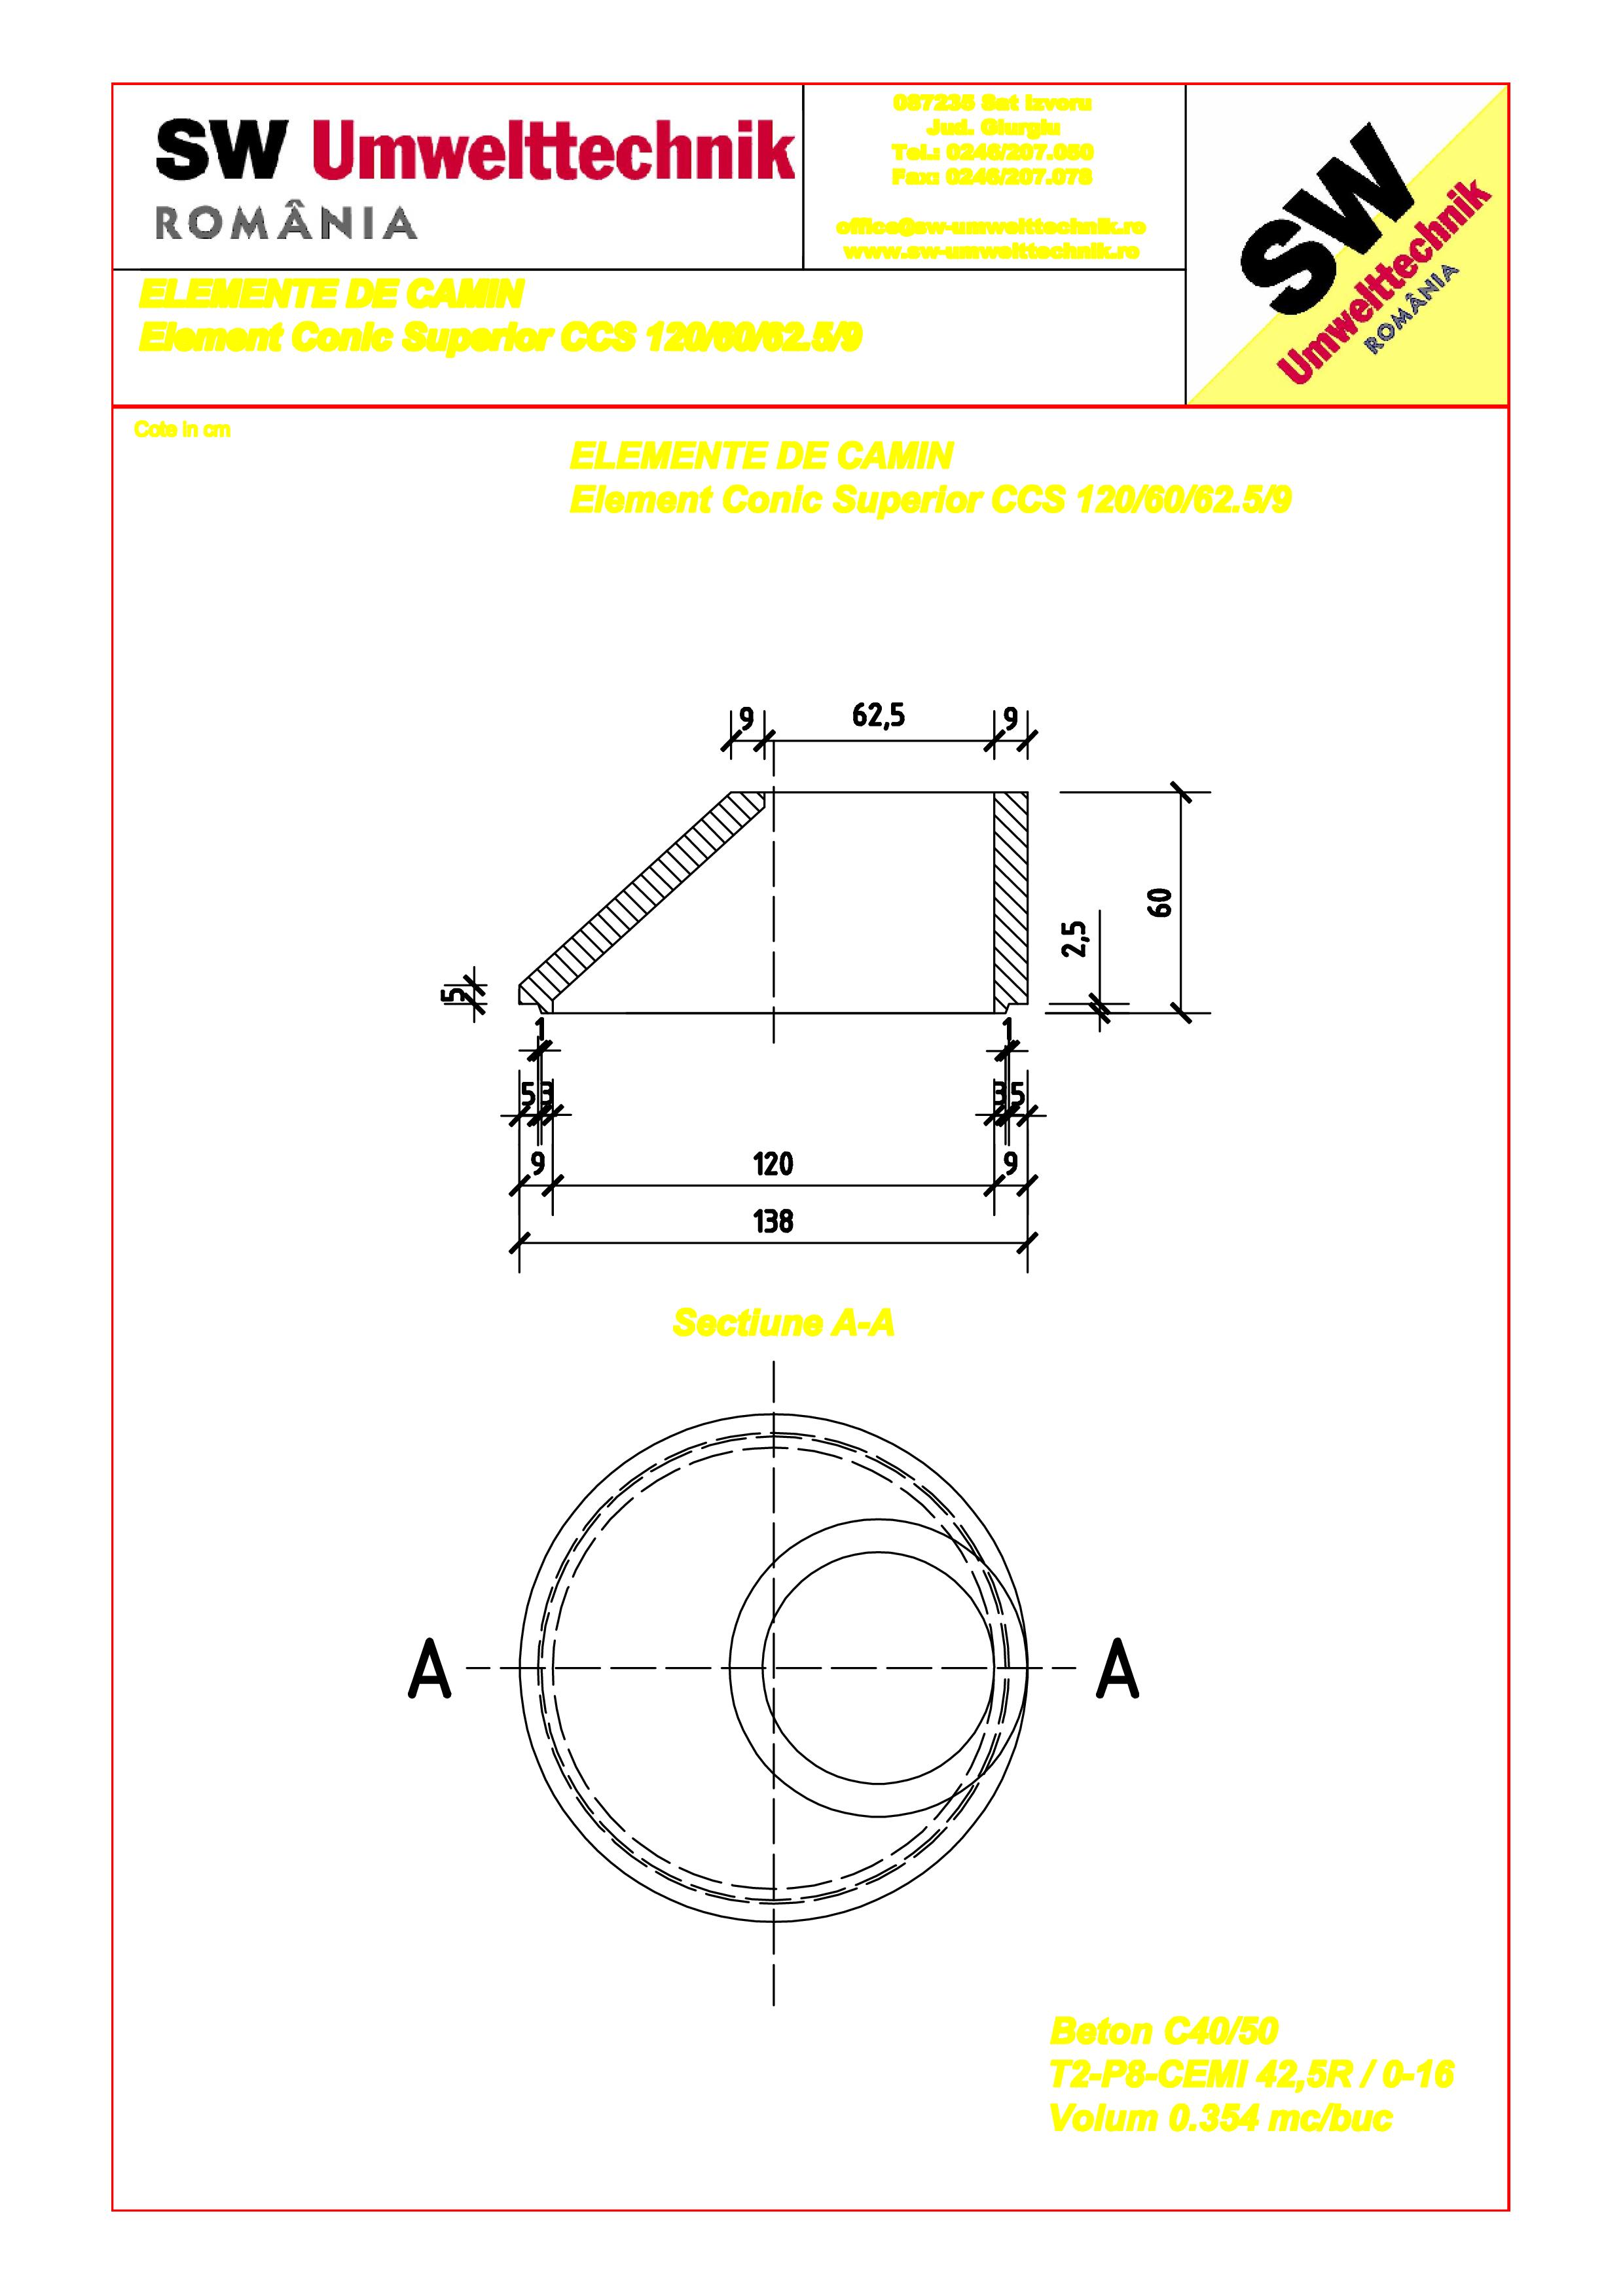 Pagina 1 - CAD-PDF Element conic superior DN120 H60 SW UMWELTTECHNIK Detaliu de produs